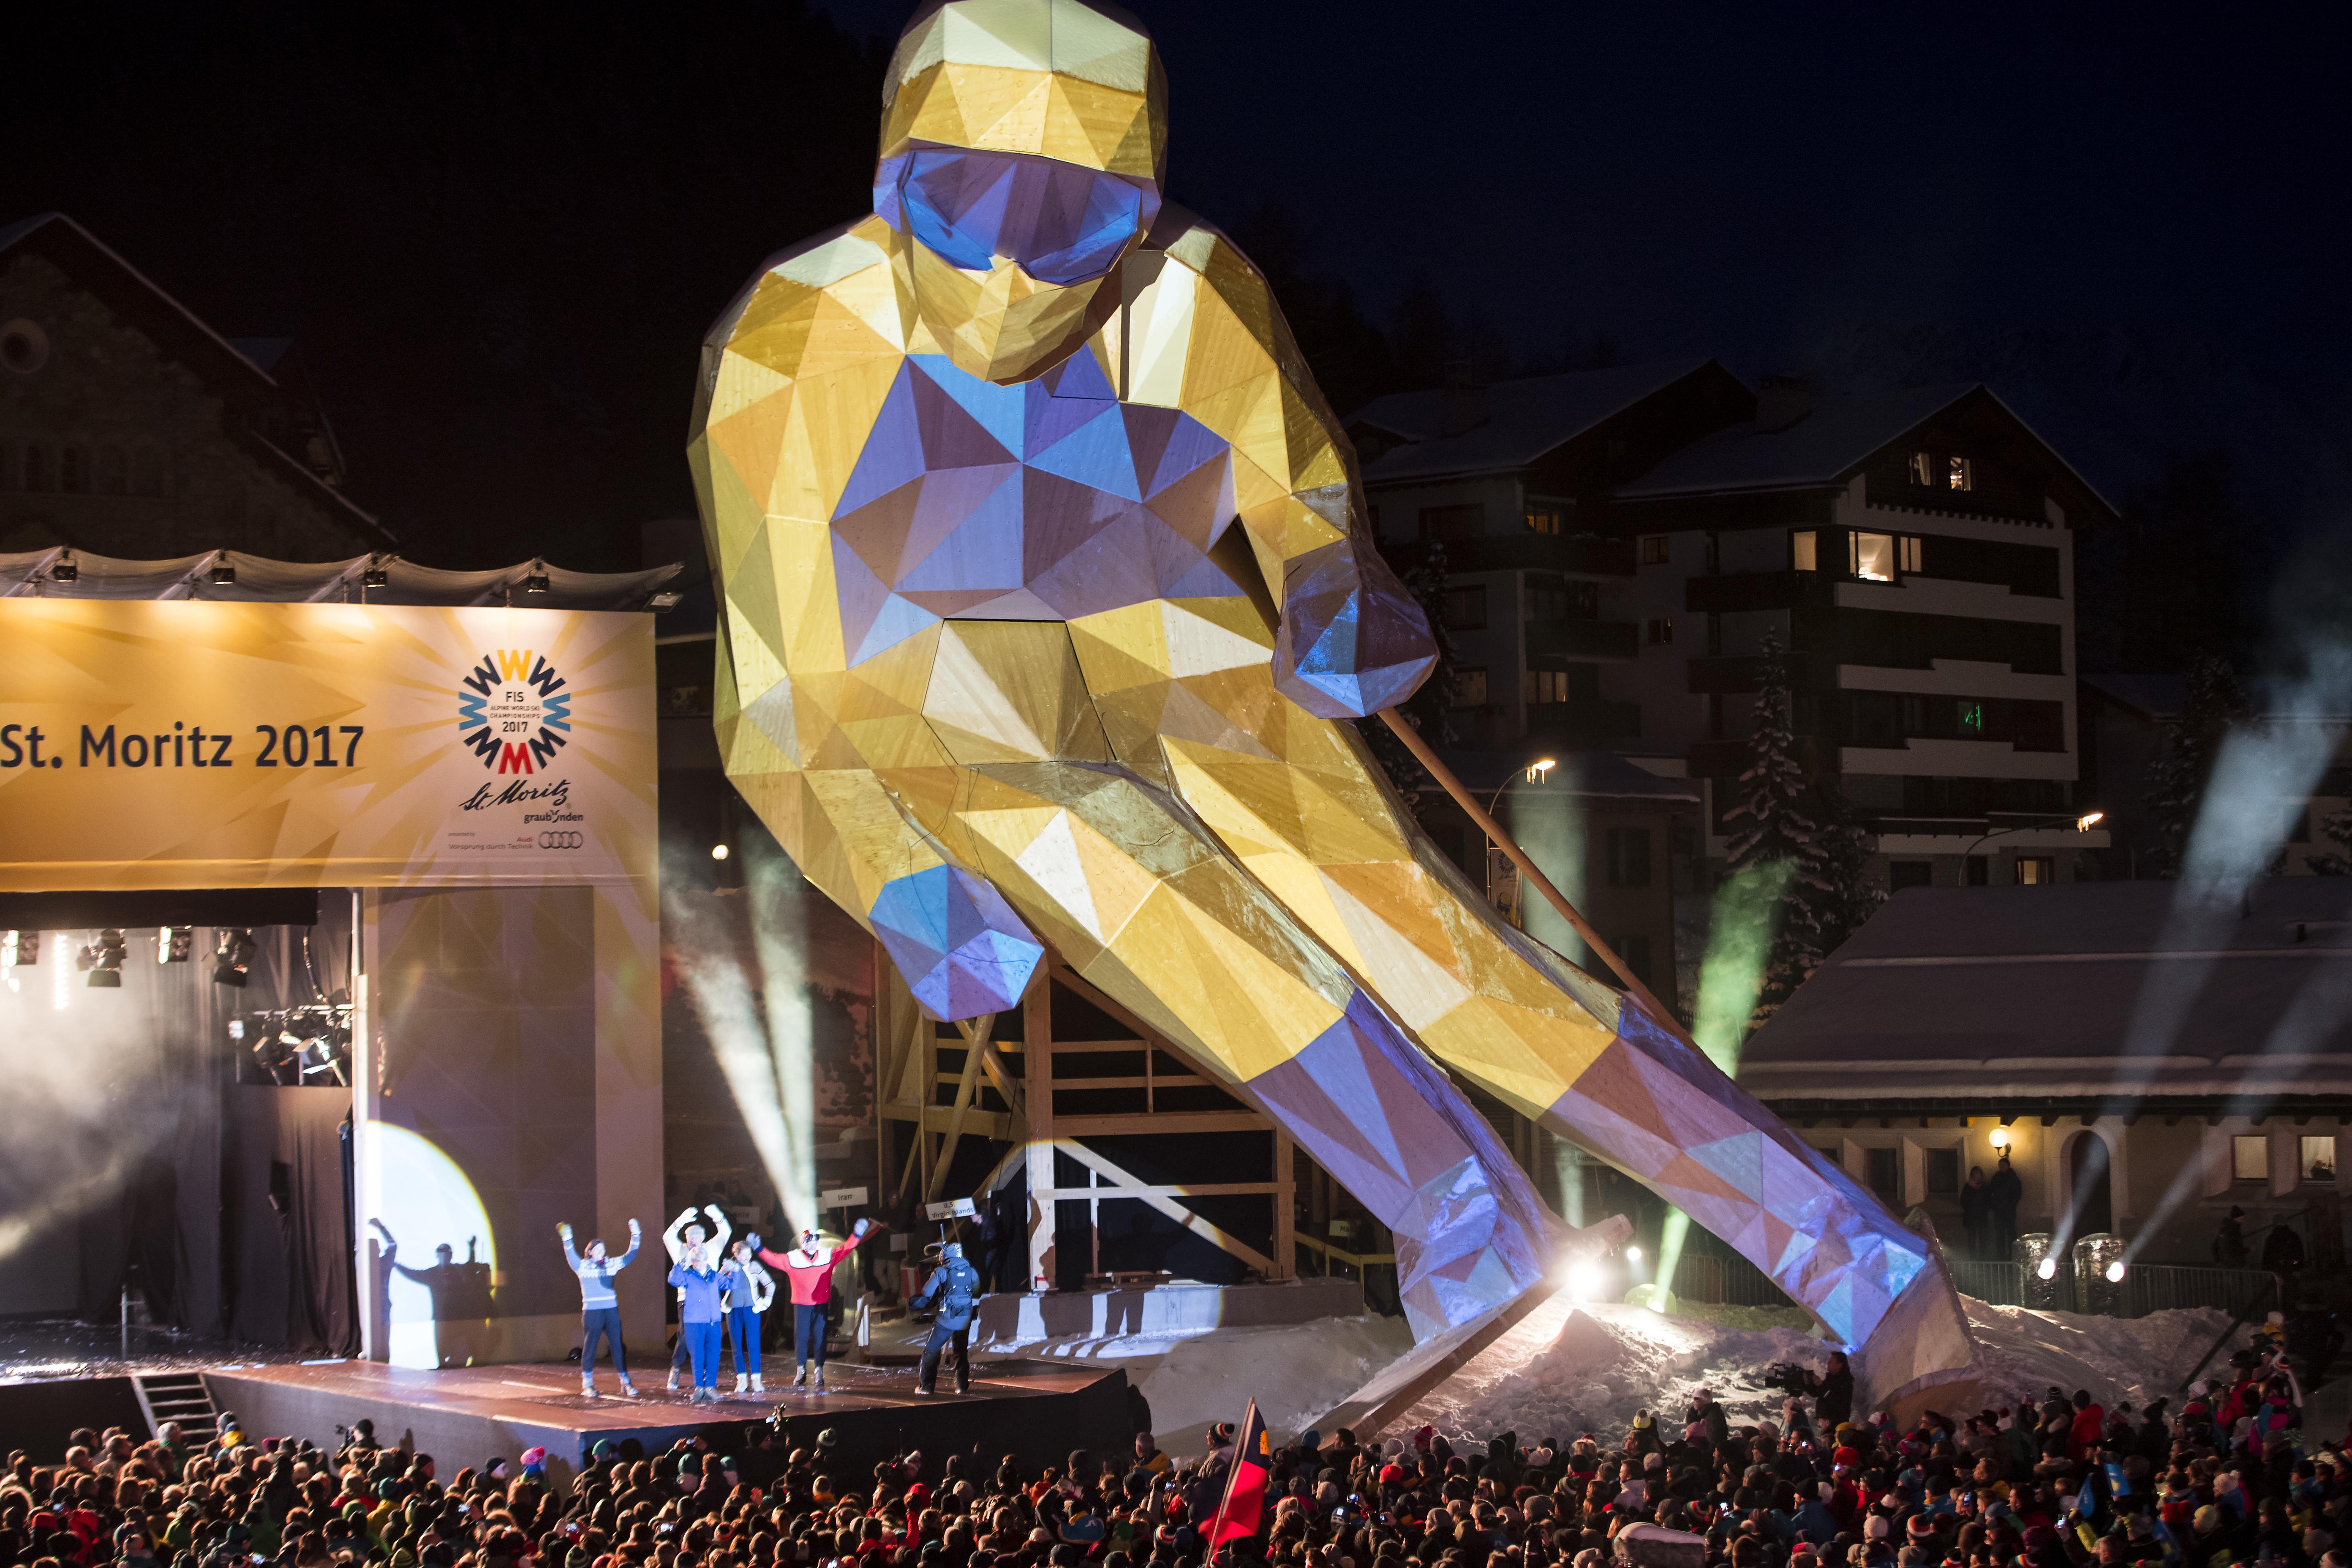 People attend the opening ceremony of the 2017 FIS Alpine Skiing World Championships in St. Moritz, Switzerland, Monday, Feb. 6, 2017.  (Jean-Christophe Bott/Keystone via AP)